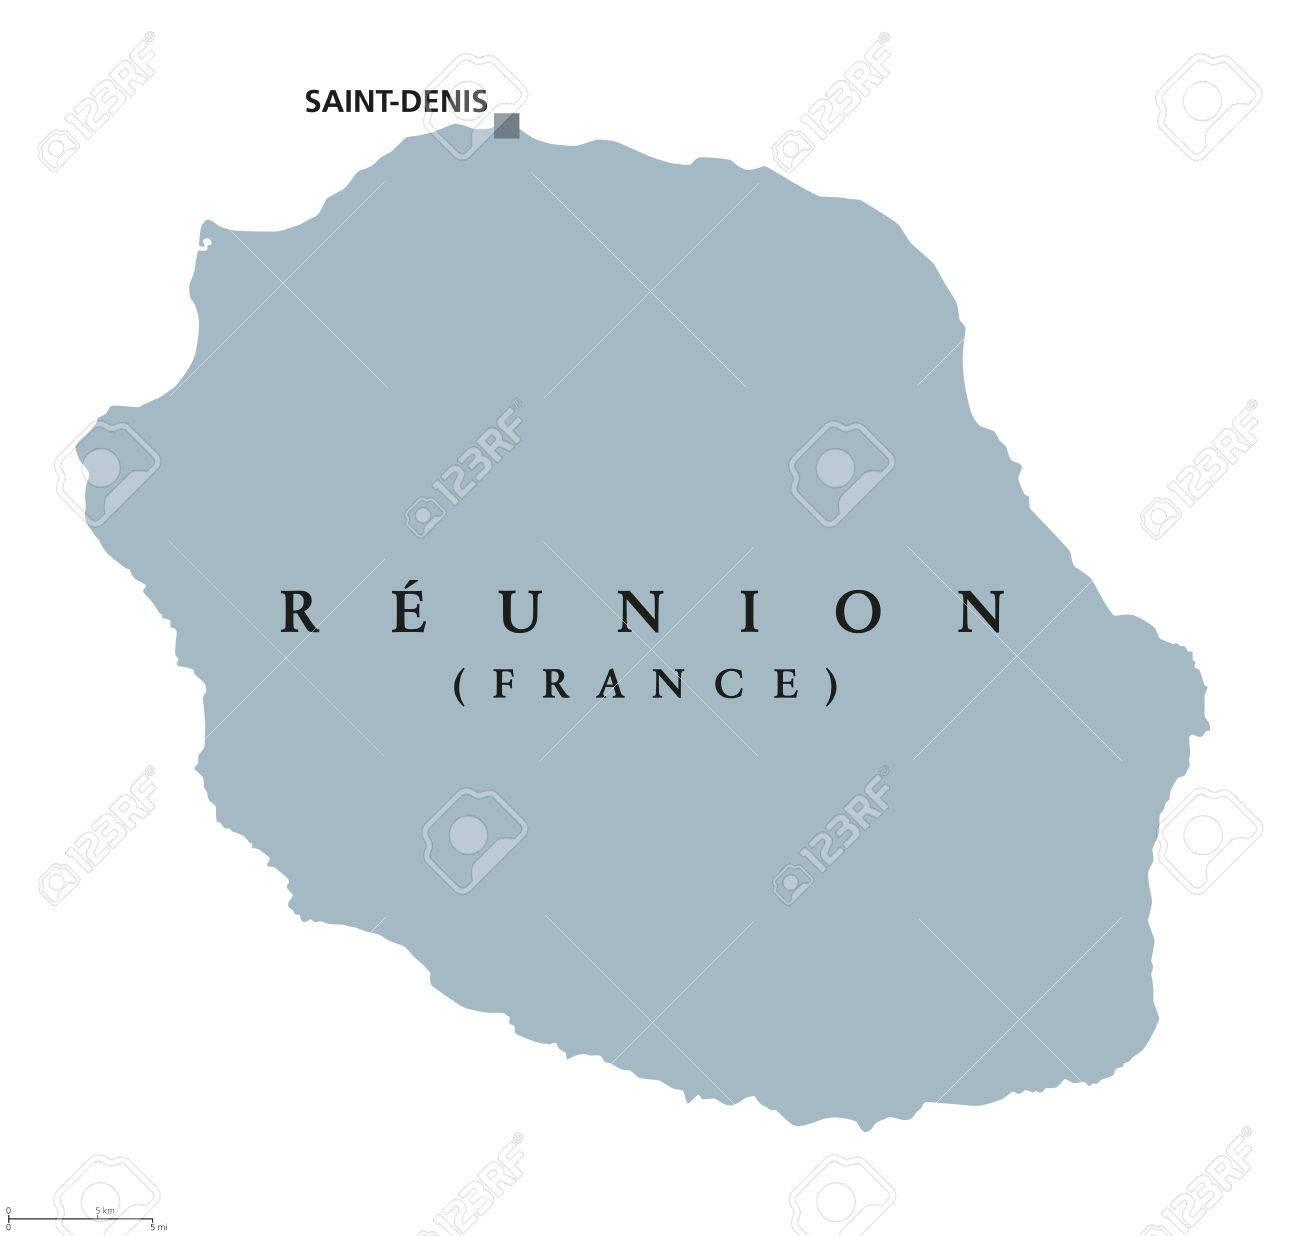 Saint Denis France Map.Reunion Political Map With Capital Saint Denis Island Overseas